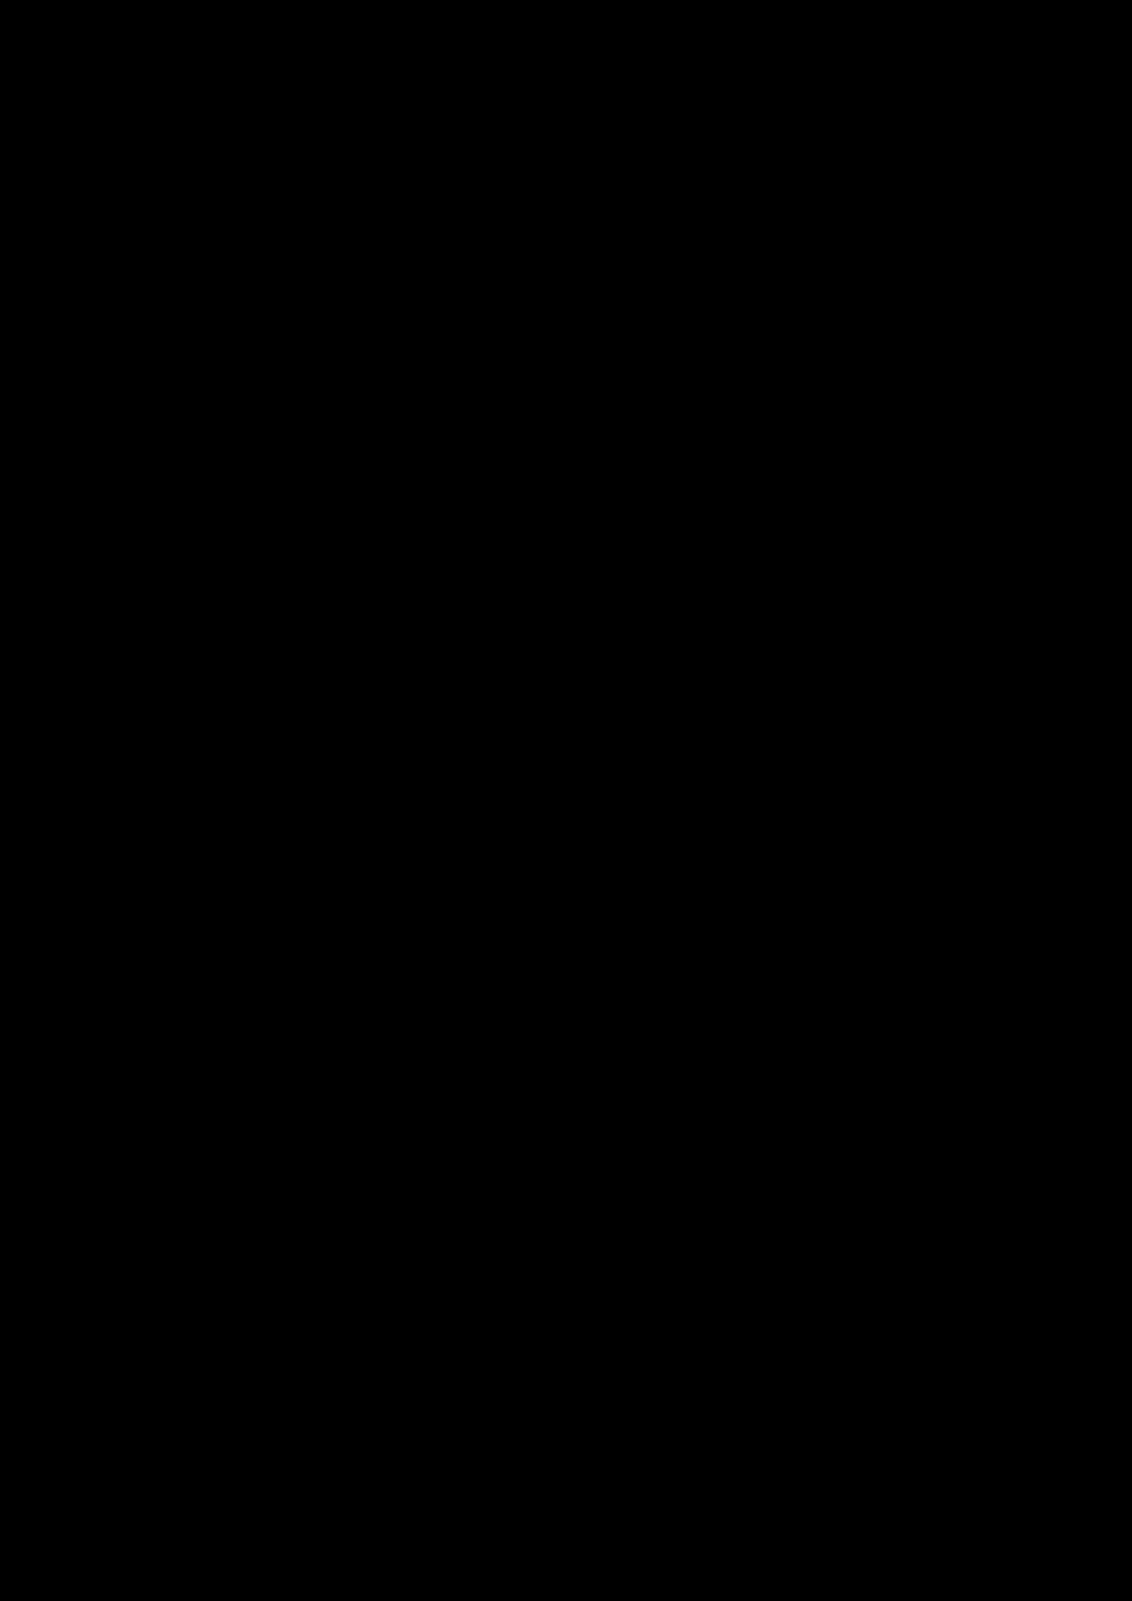 Belyiy sokol slide, Image 134